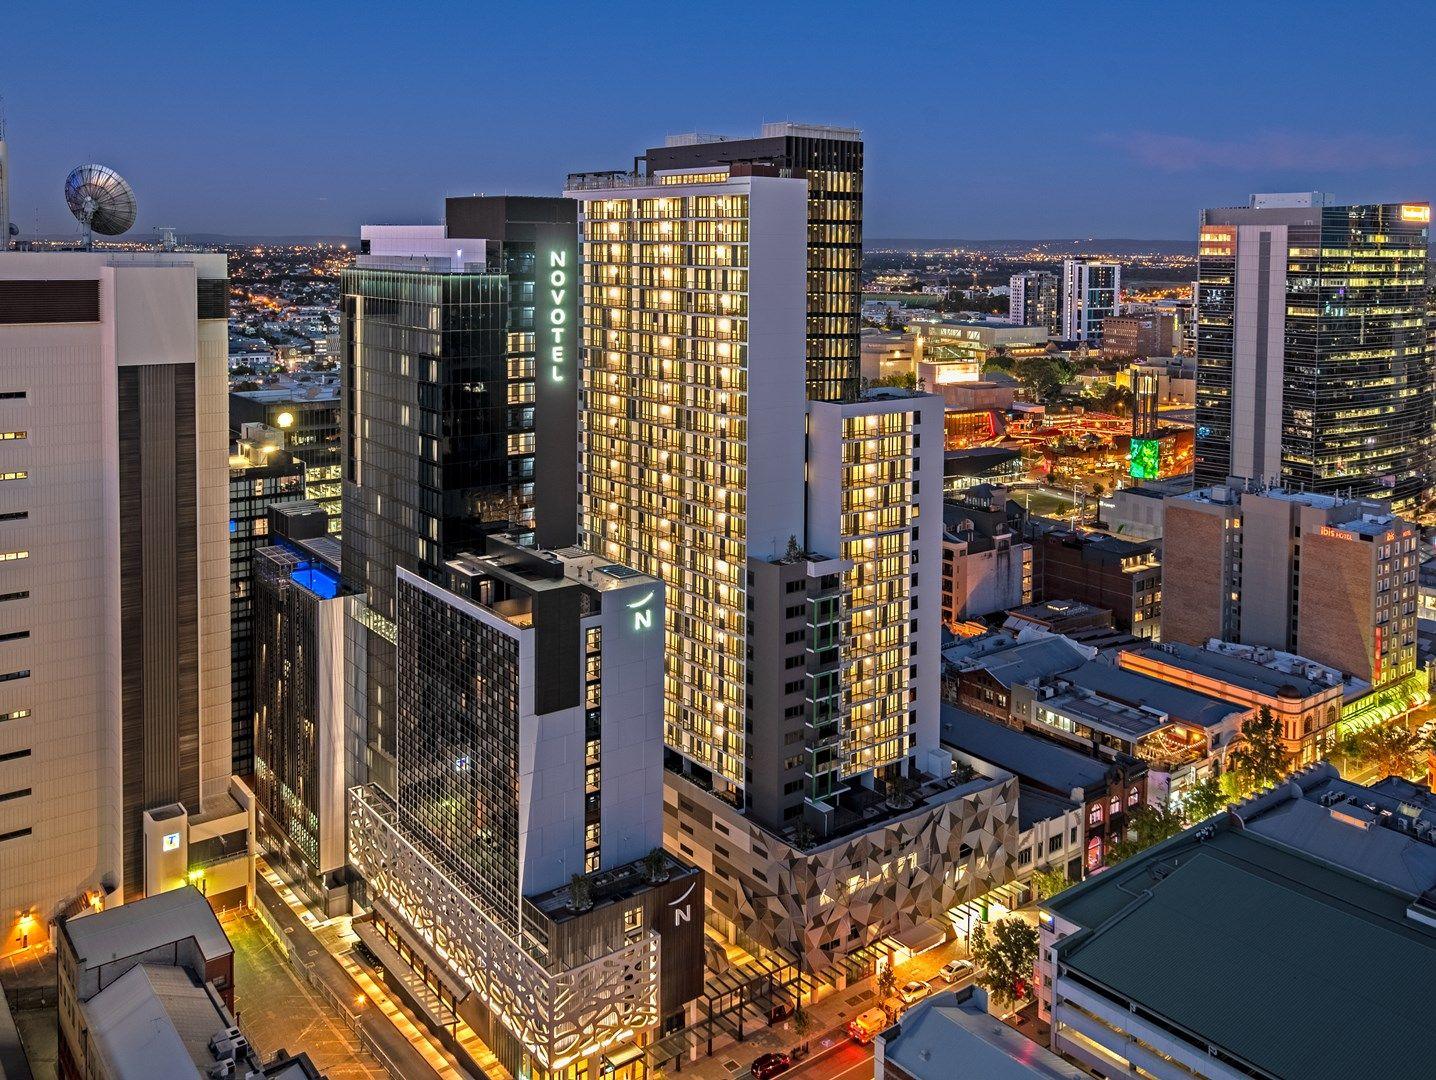 2 bedrooms Apartment / Unit / Flat in 1014/380 Murray Street PERTH WA, 6000